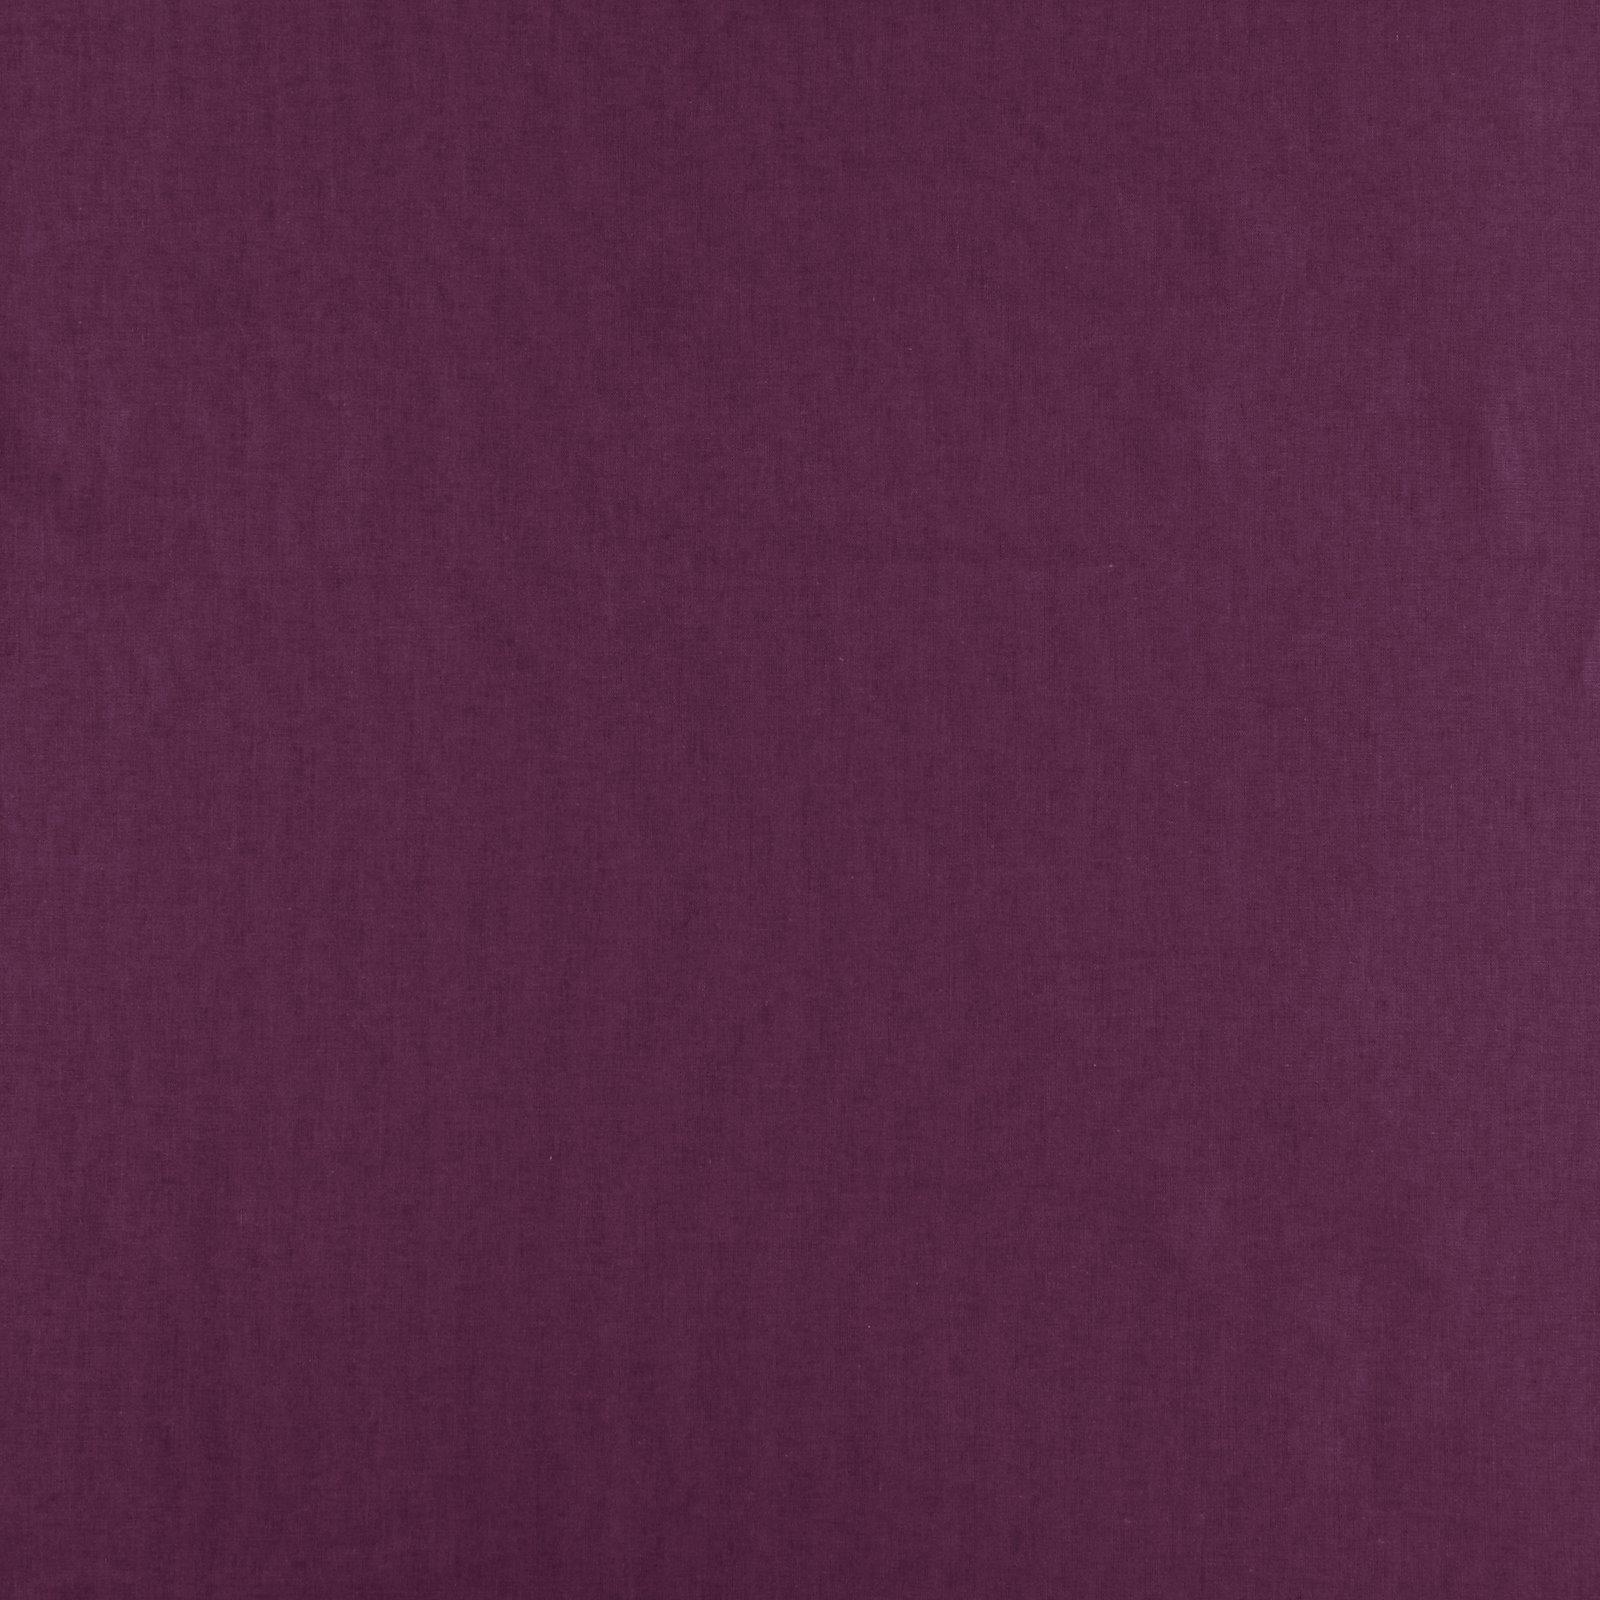 Linen/cotton light eggplant 410127_pack_solid